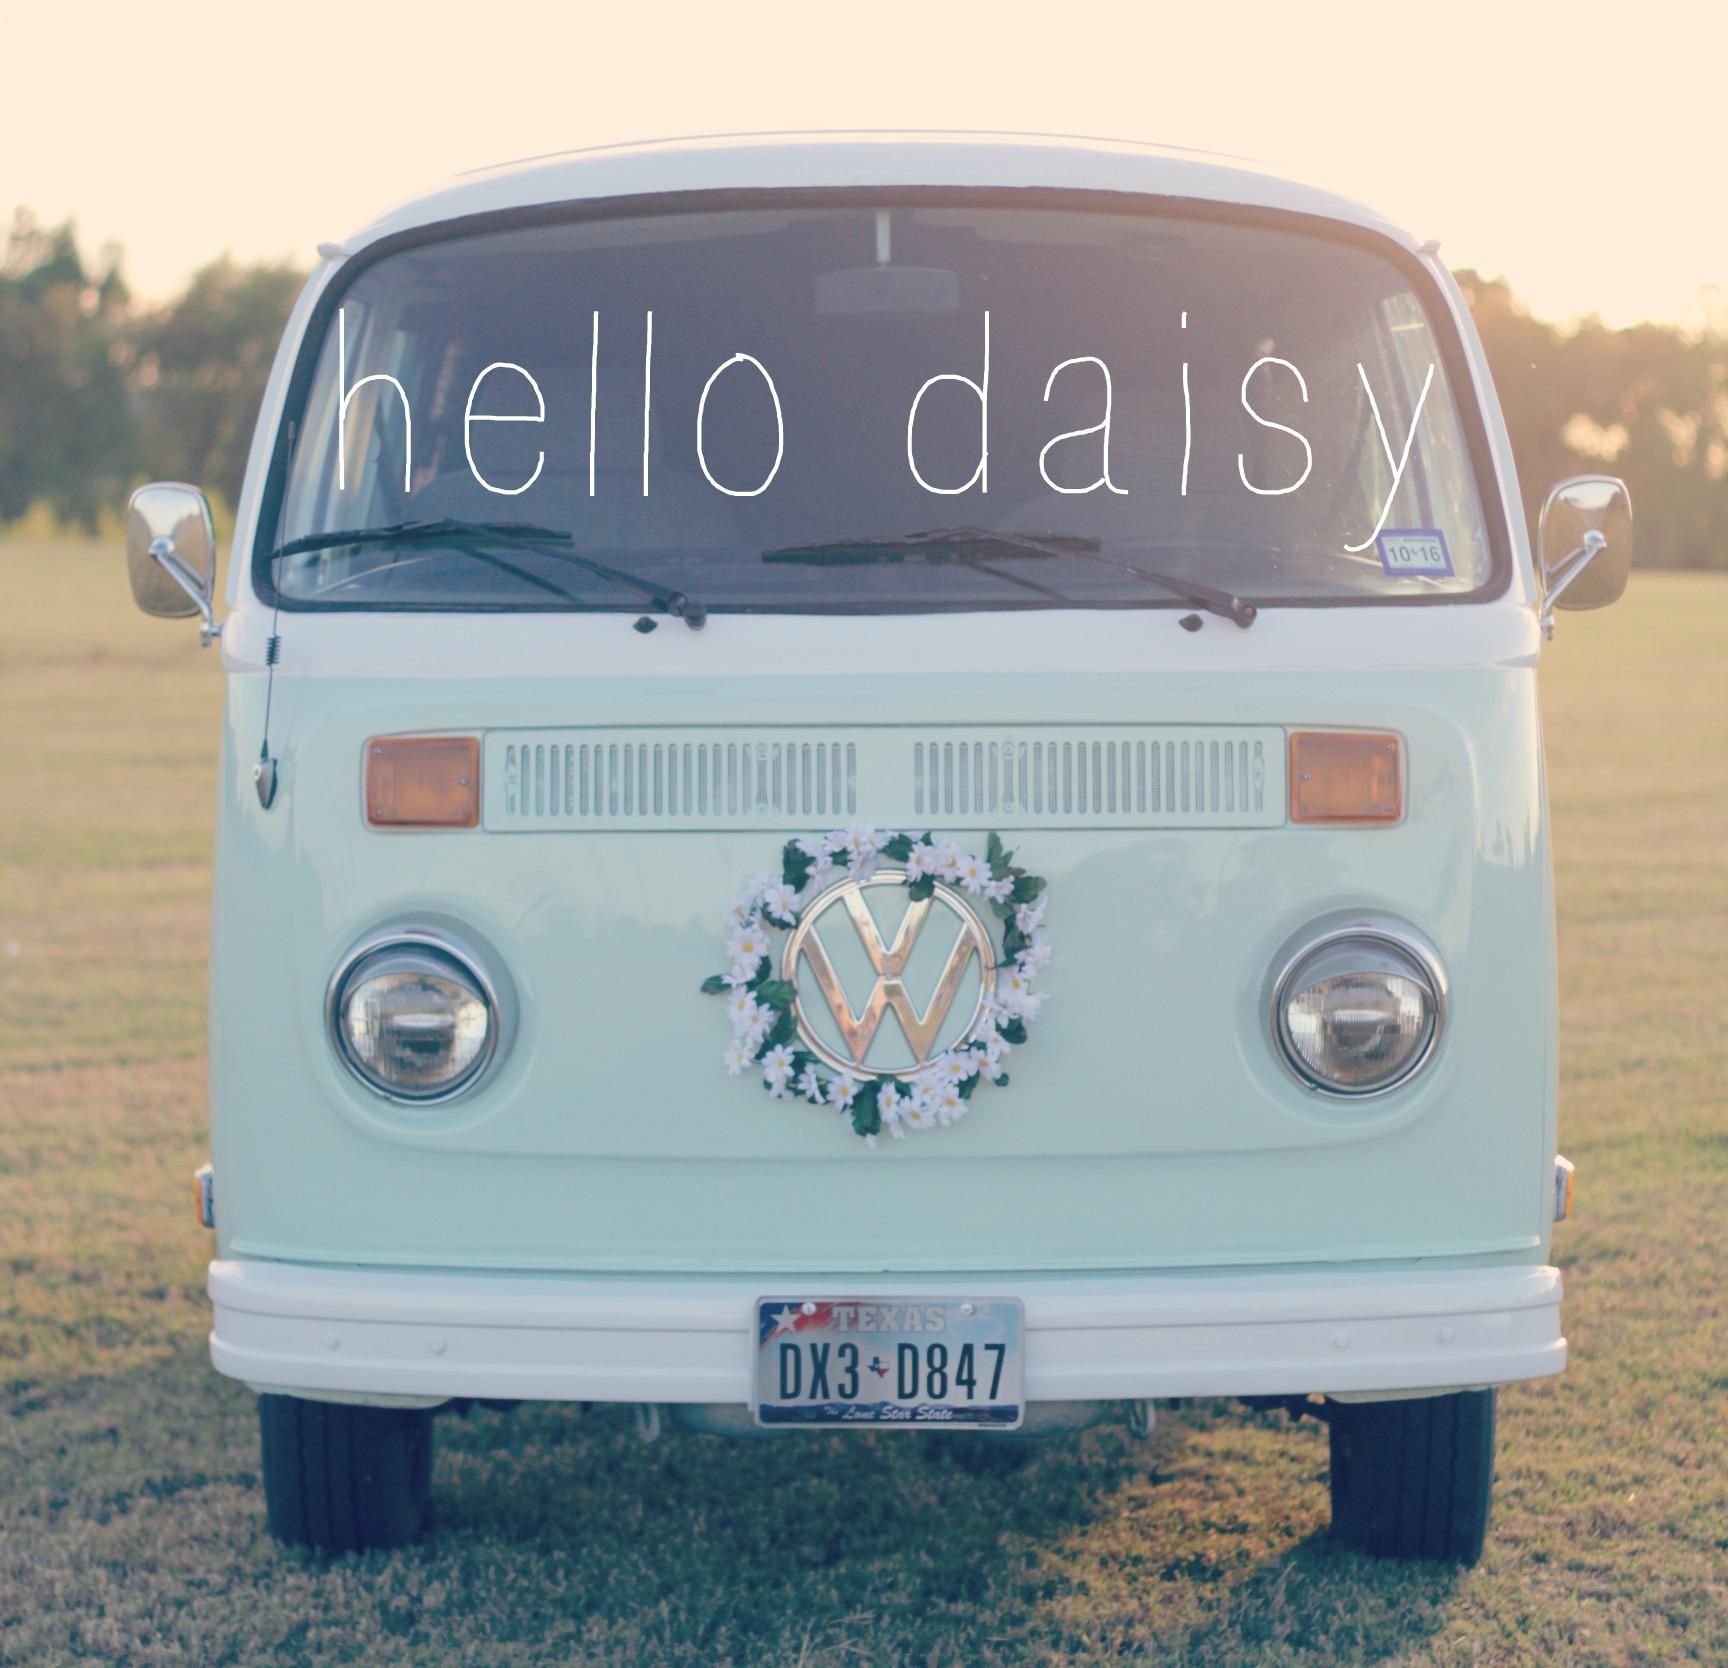 Daisy photobus photobooth Houston